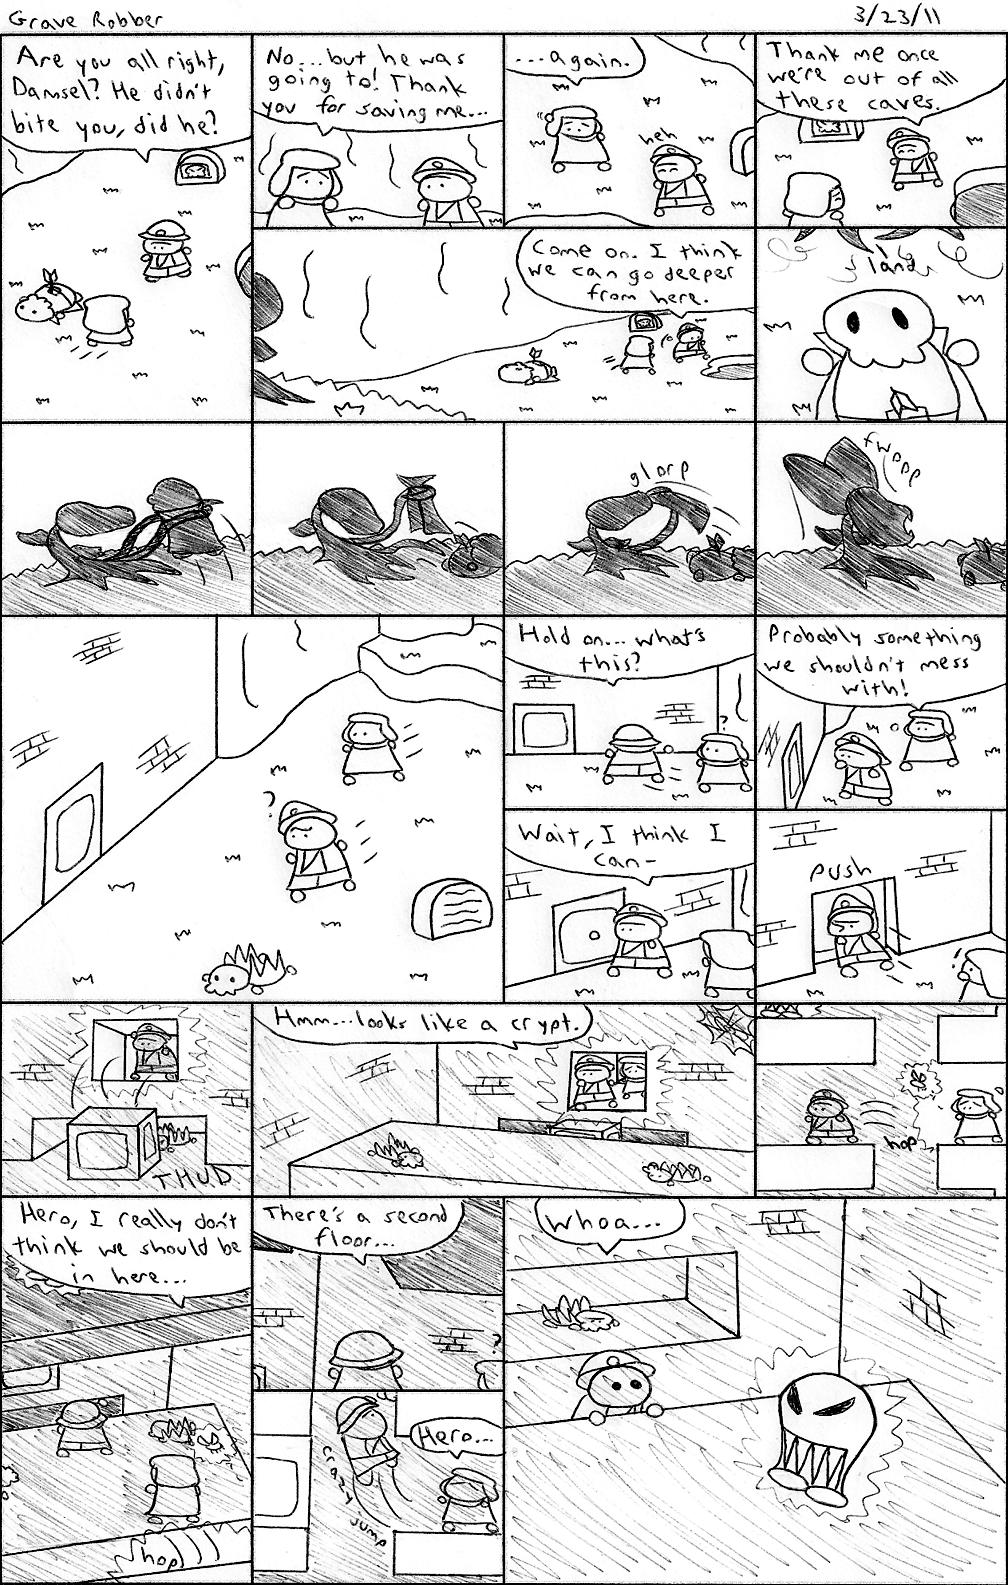 45 Grave Robber